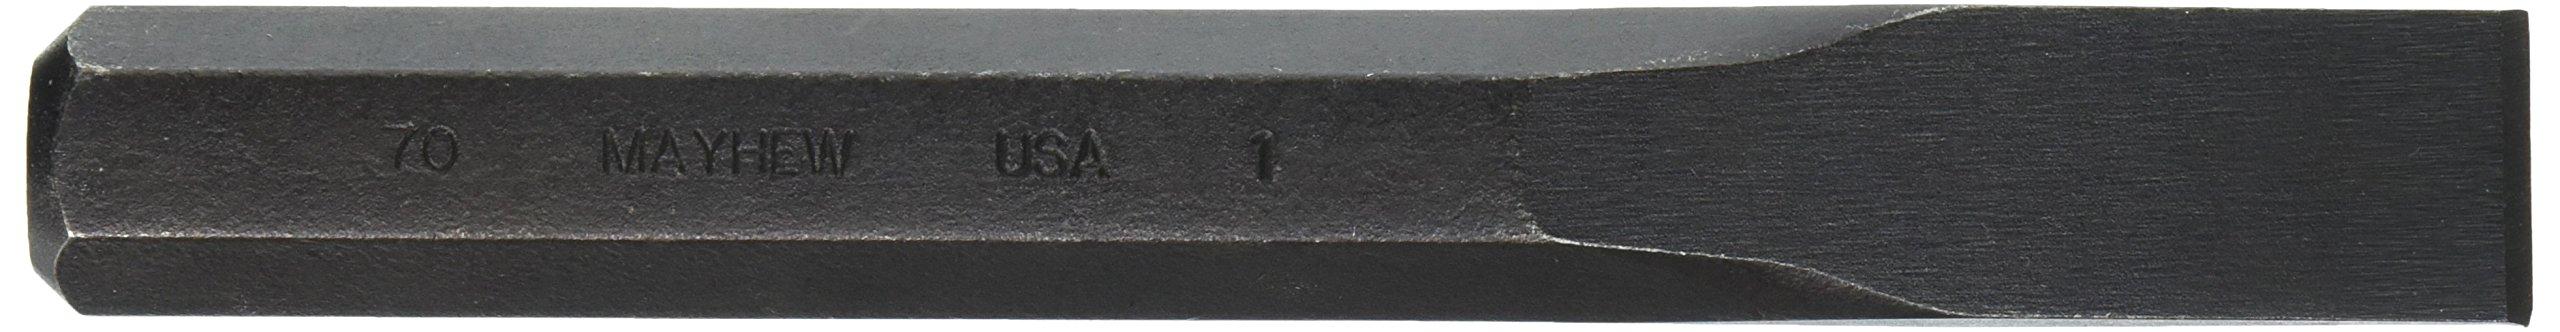 Mayhew 10220 1'' Black Oxide Cold Chisel